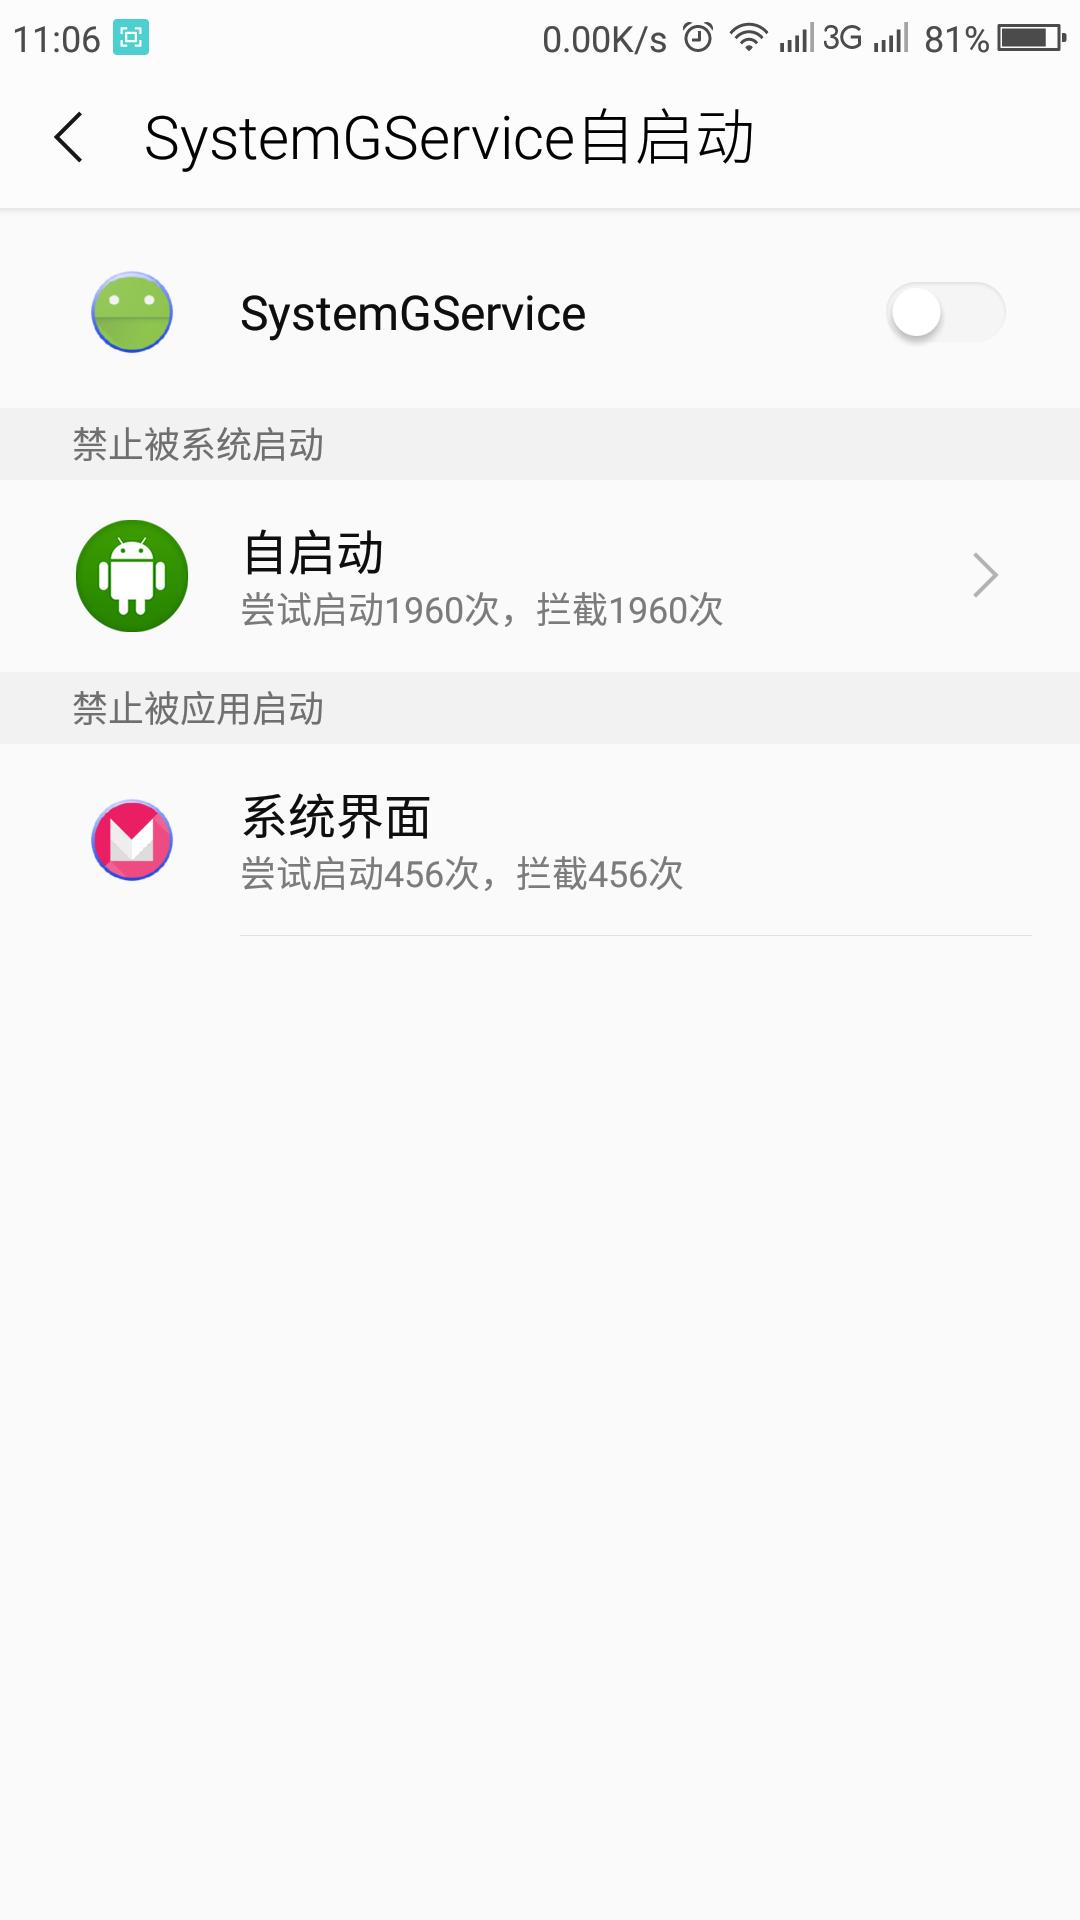 Screenshot_2018-05-10-11-06-13.png